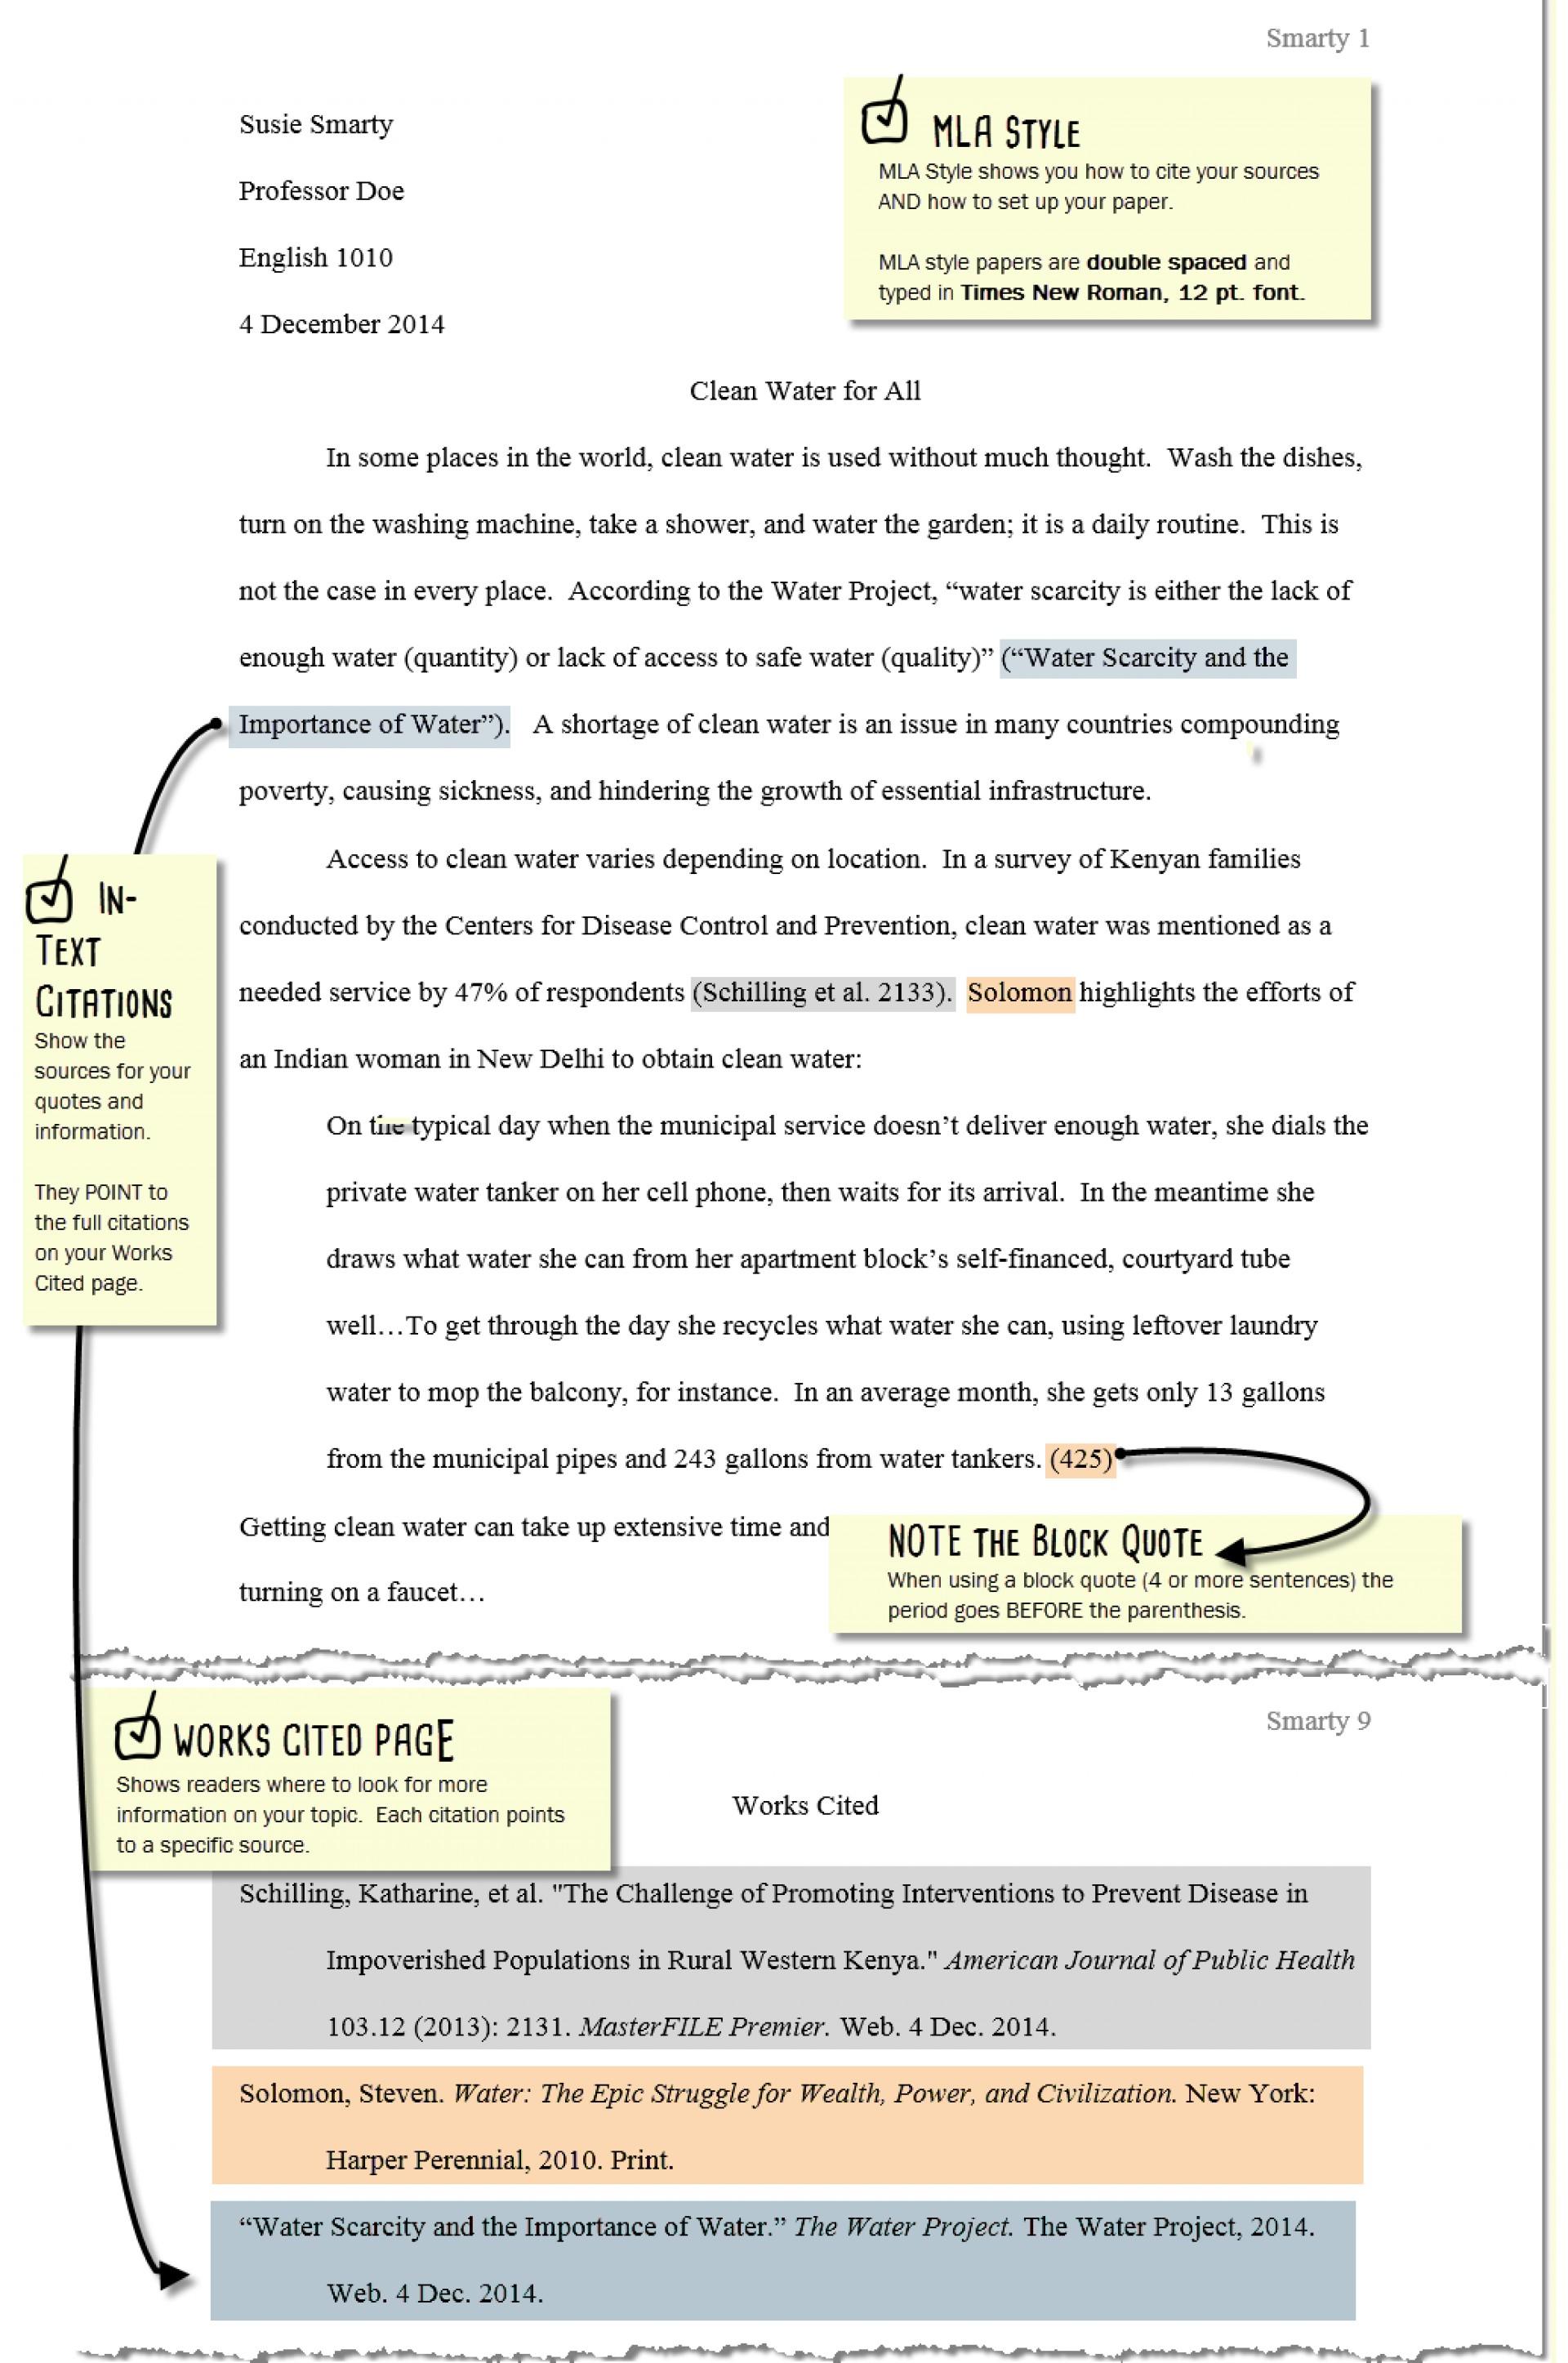 010 Mla Citation Essay For Example Harvard Referencing